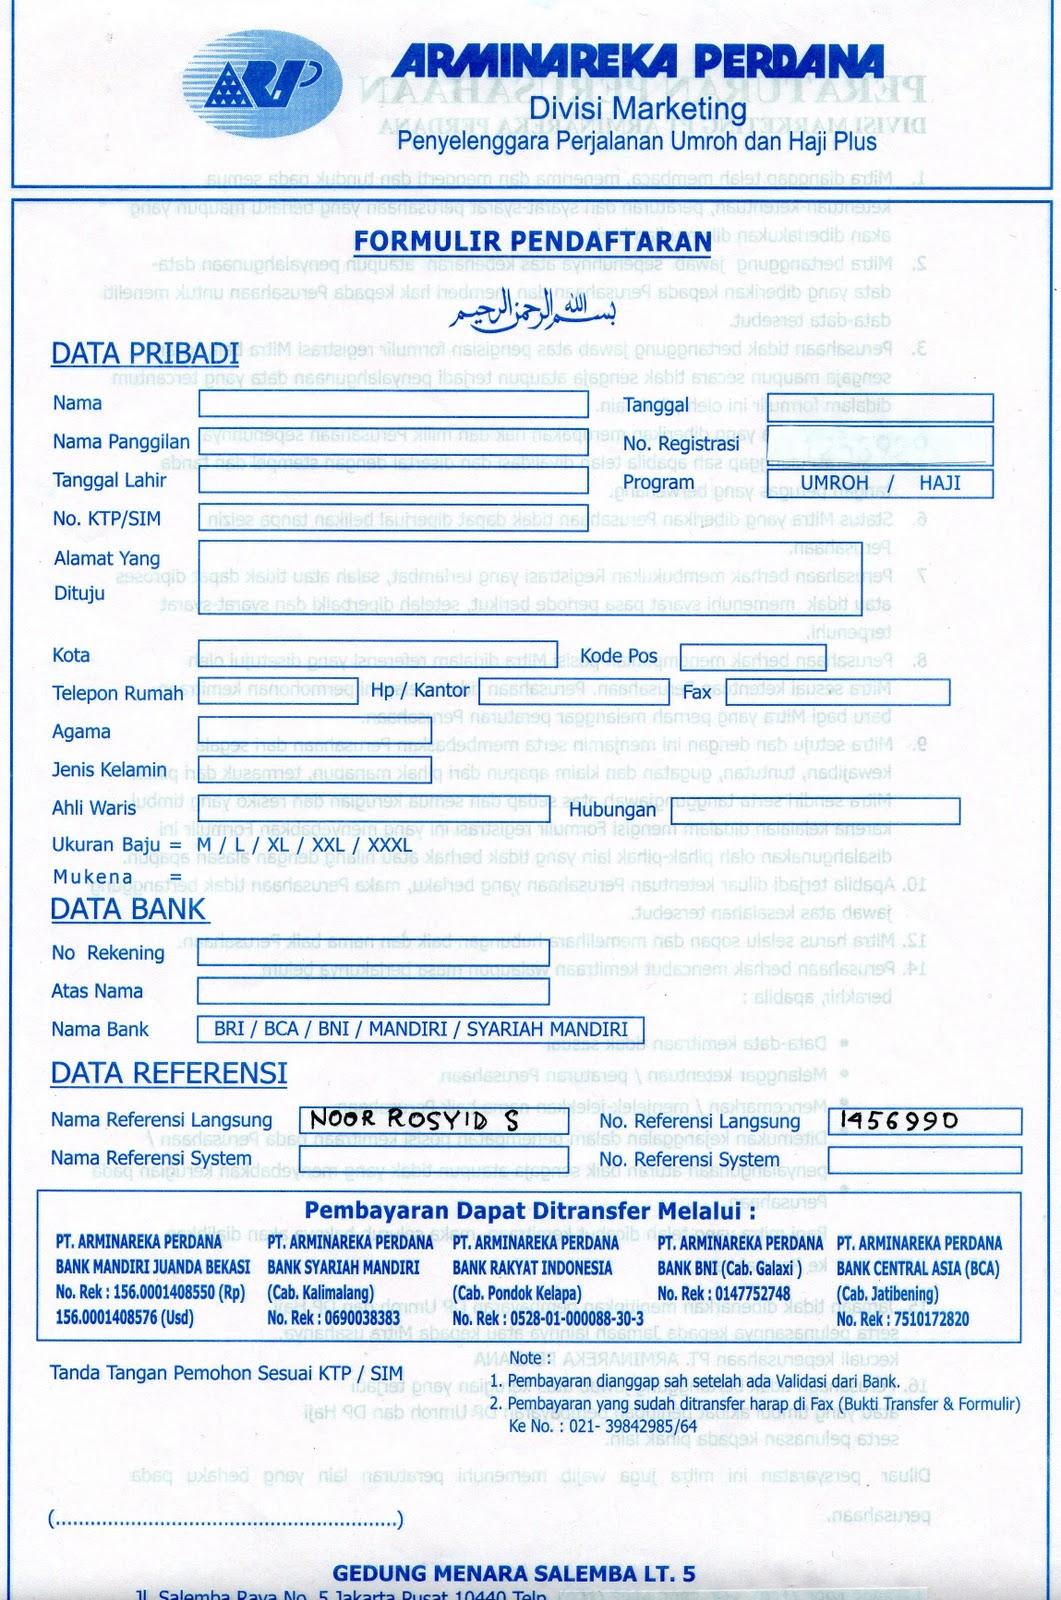 Share Form Formulir Pendaftaran 1792